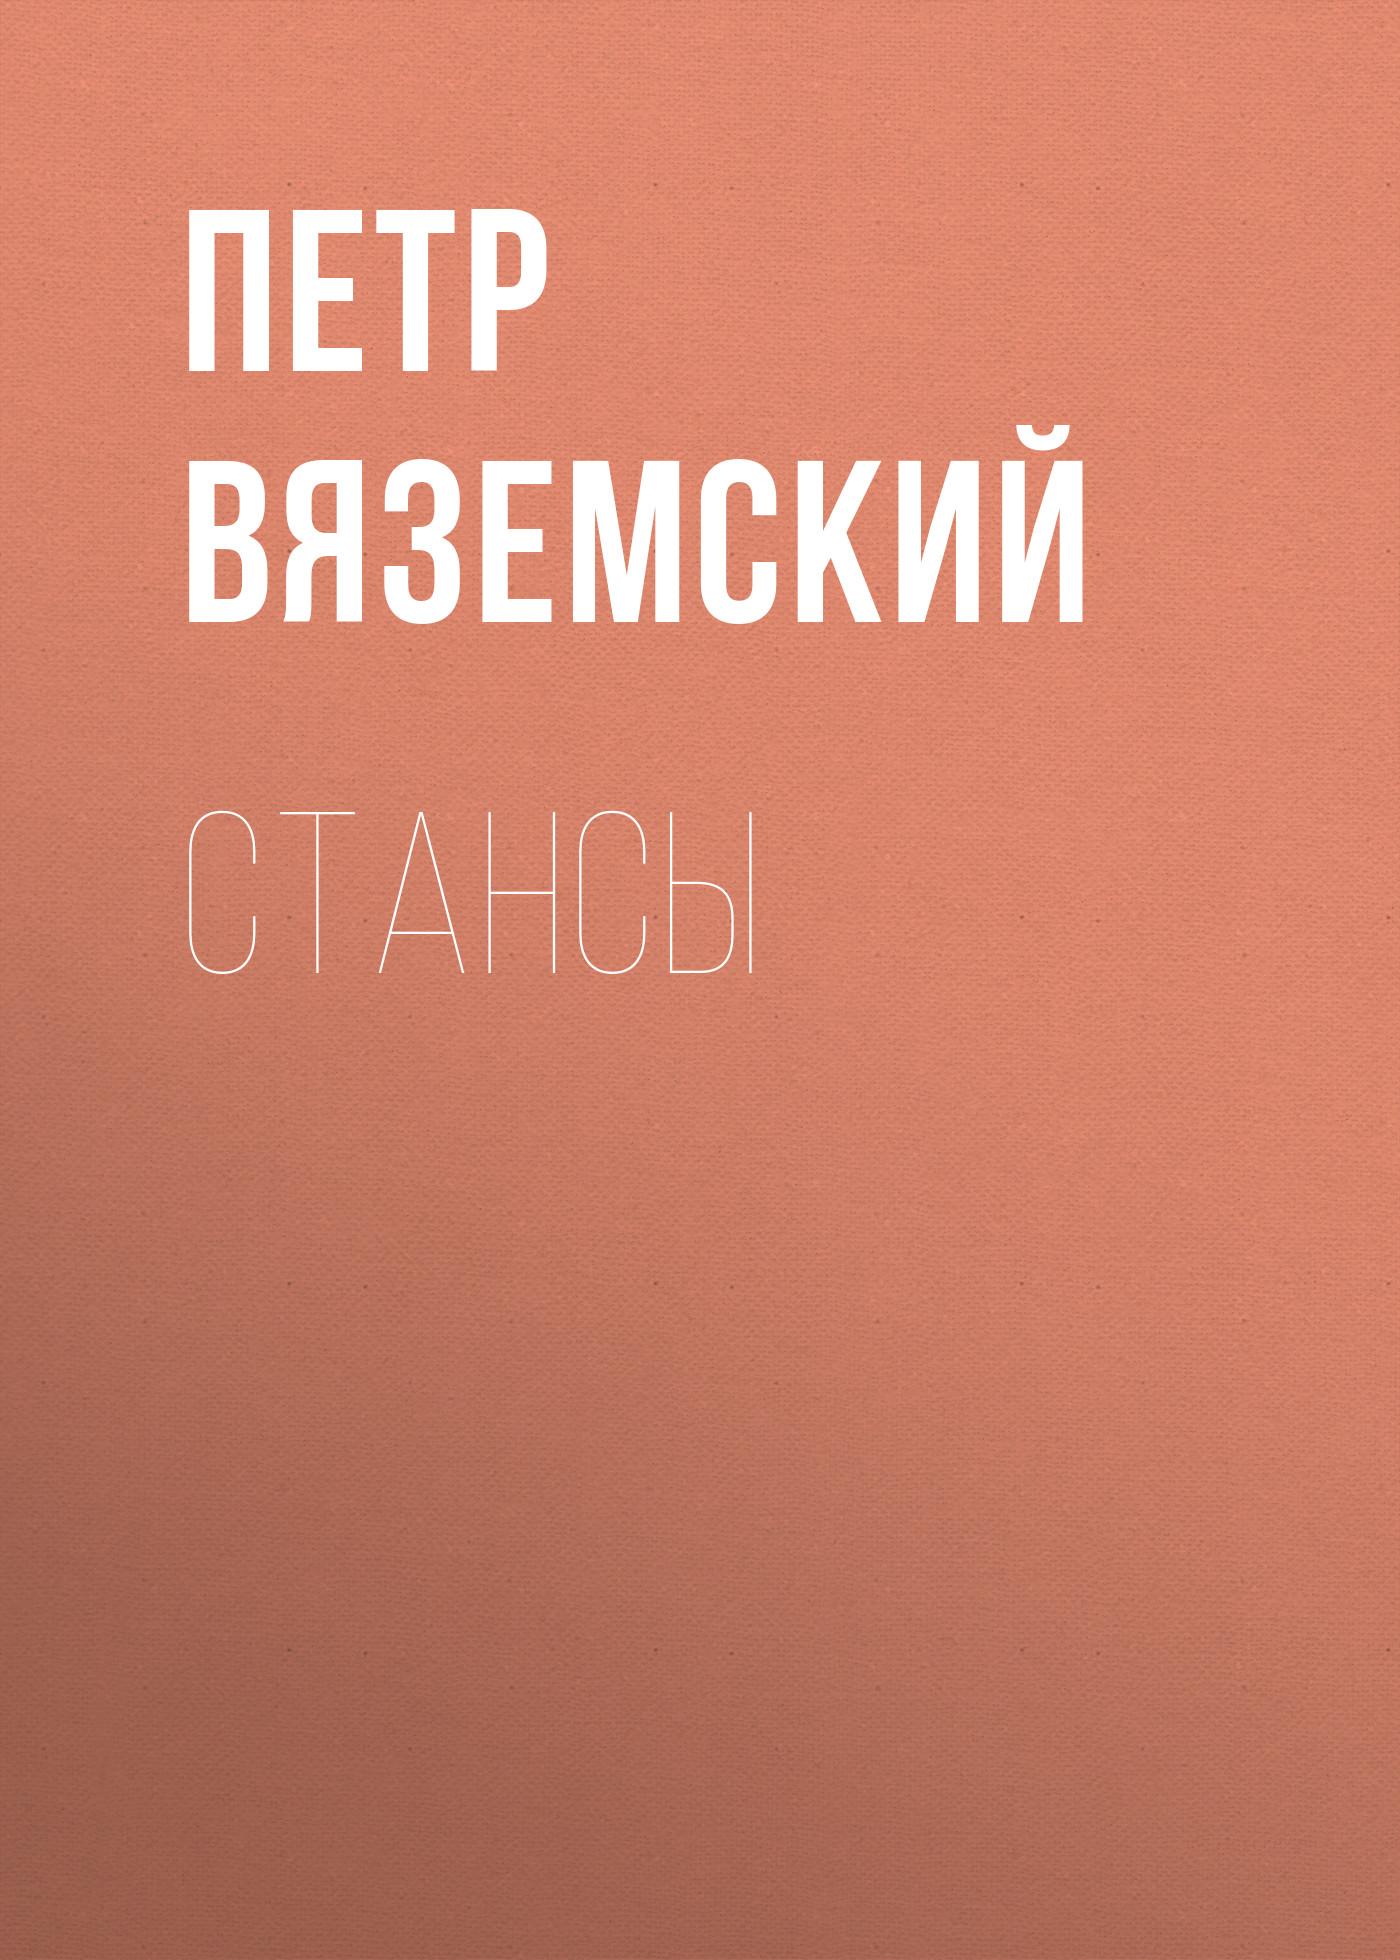 Петр Вяземский Стансы петр вяземский за границею корректурные листы